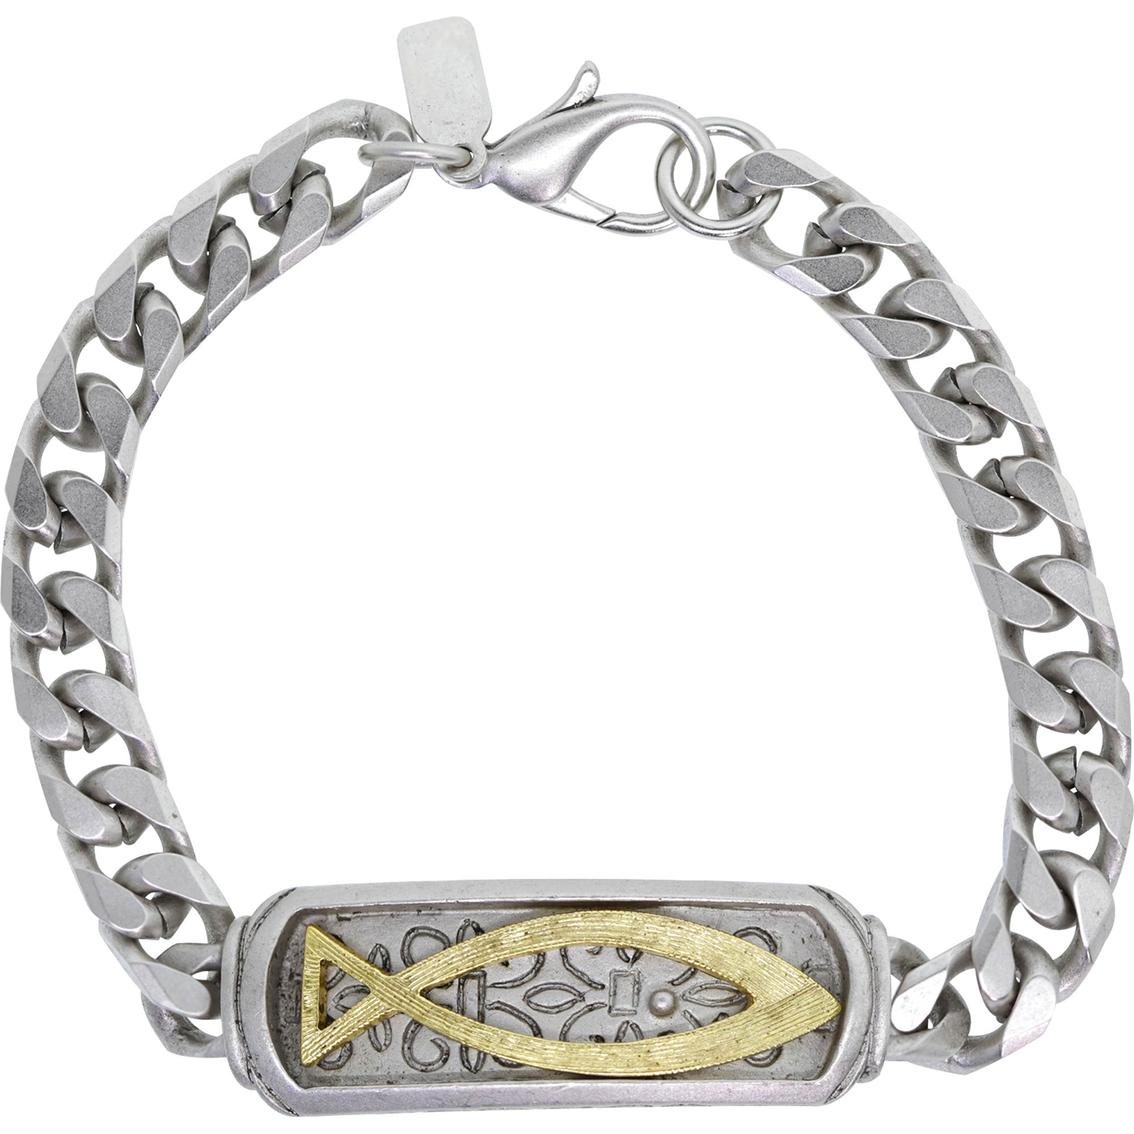 Symbols of faith two tone ichthus fish bracelet fashion symbols of faith two tone ichthus fish bracelet biocorpaavc Images